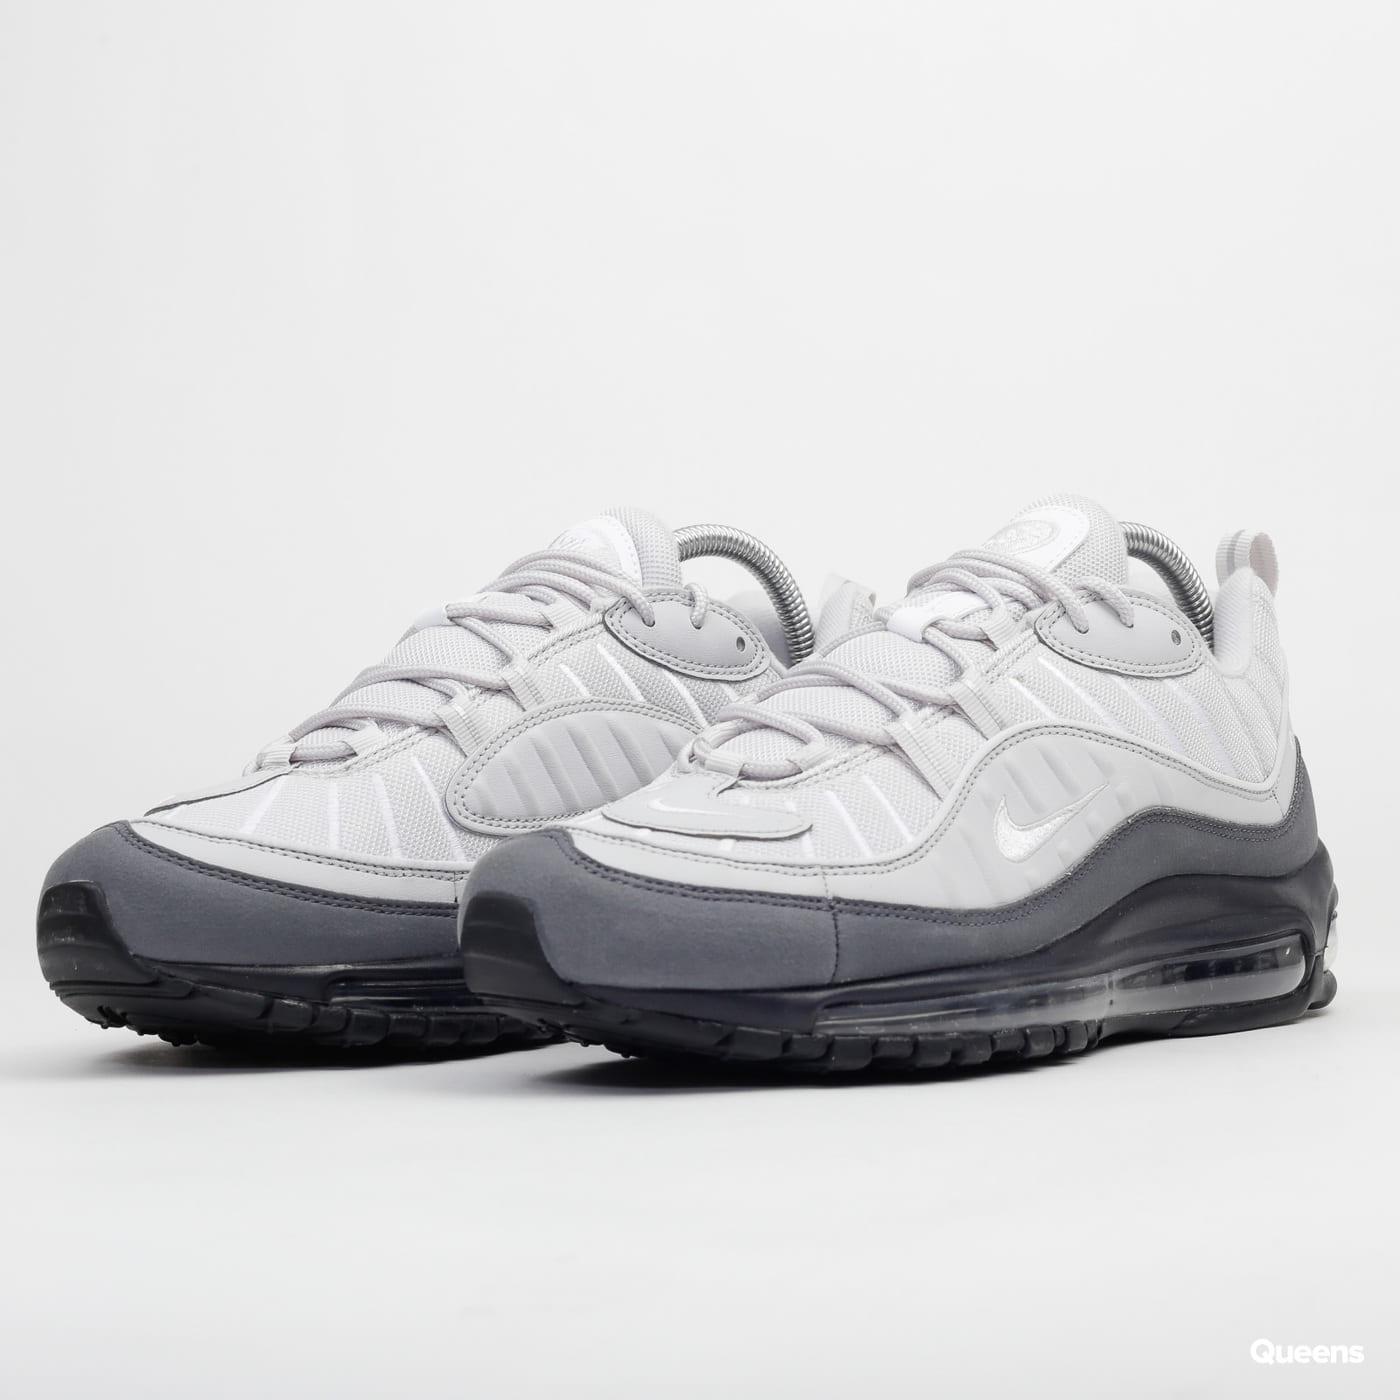 factory price a792c d9631 Nike Air Max 98 white / white - vast grey